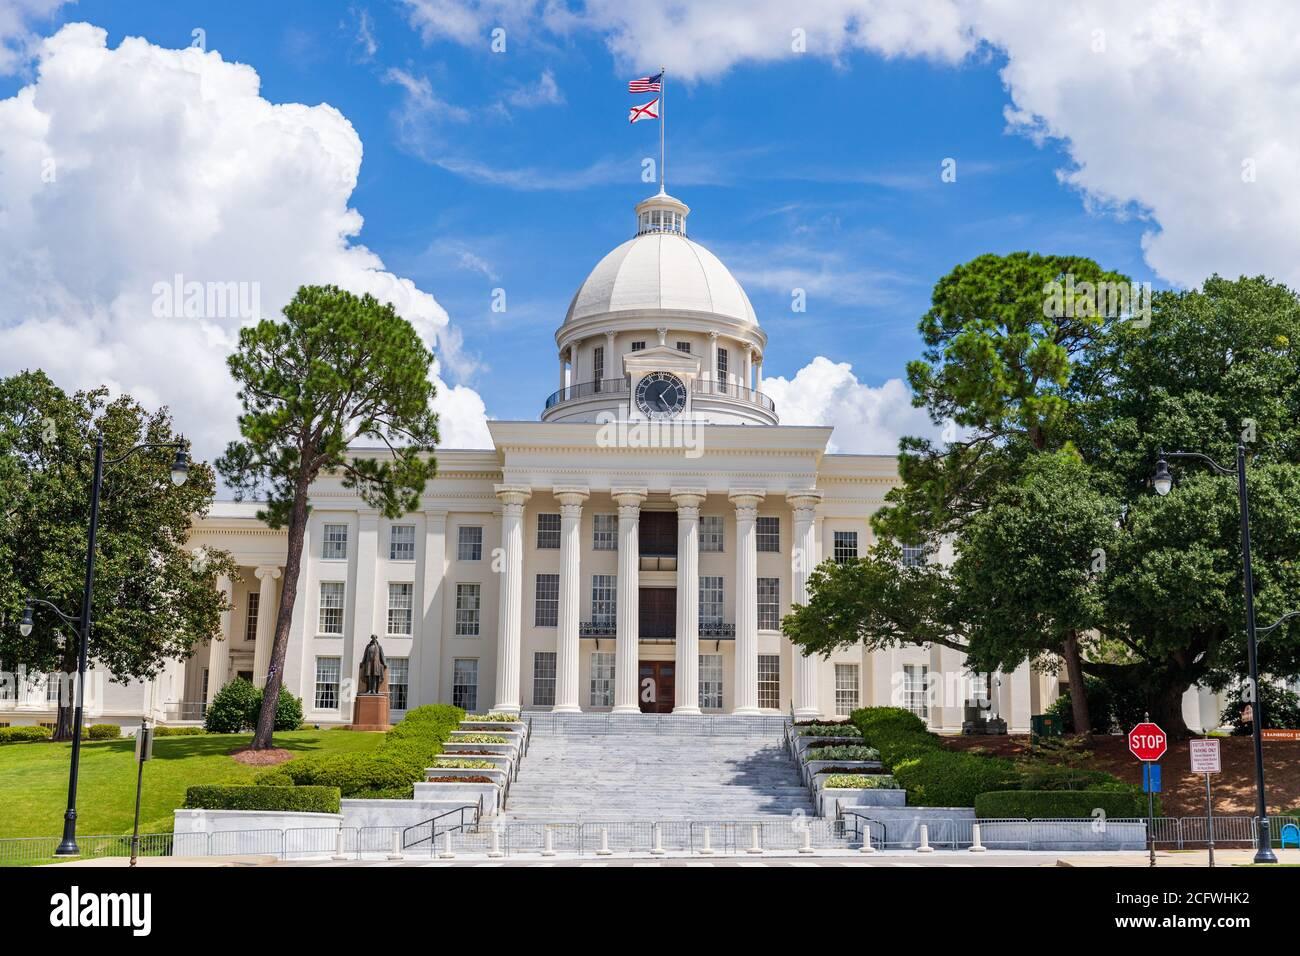 Montgomery, AL / USA - August 27, 2020: Alabama State Capitol building in Montgomery Alabama Stock Photo